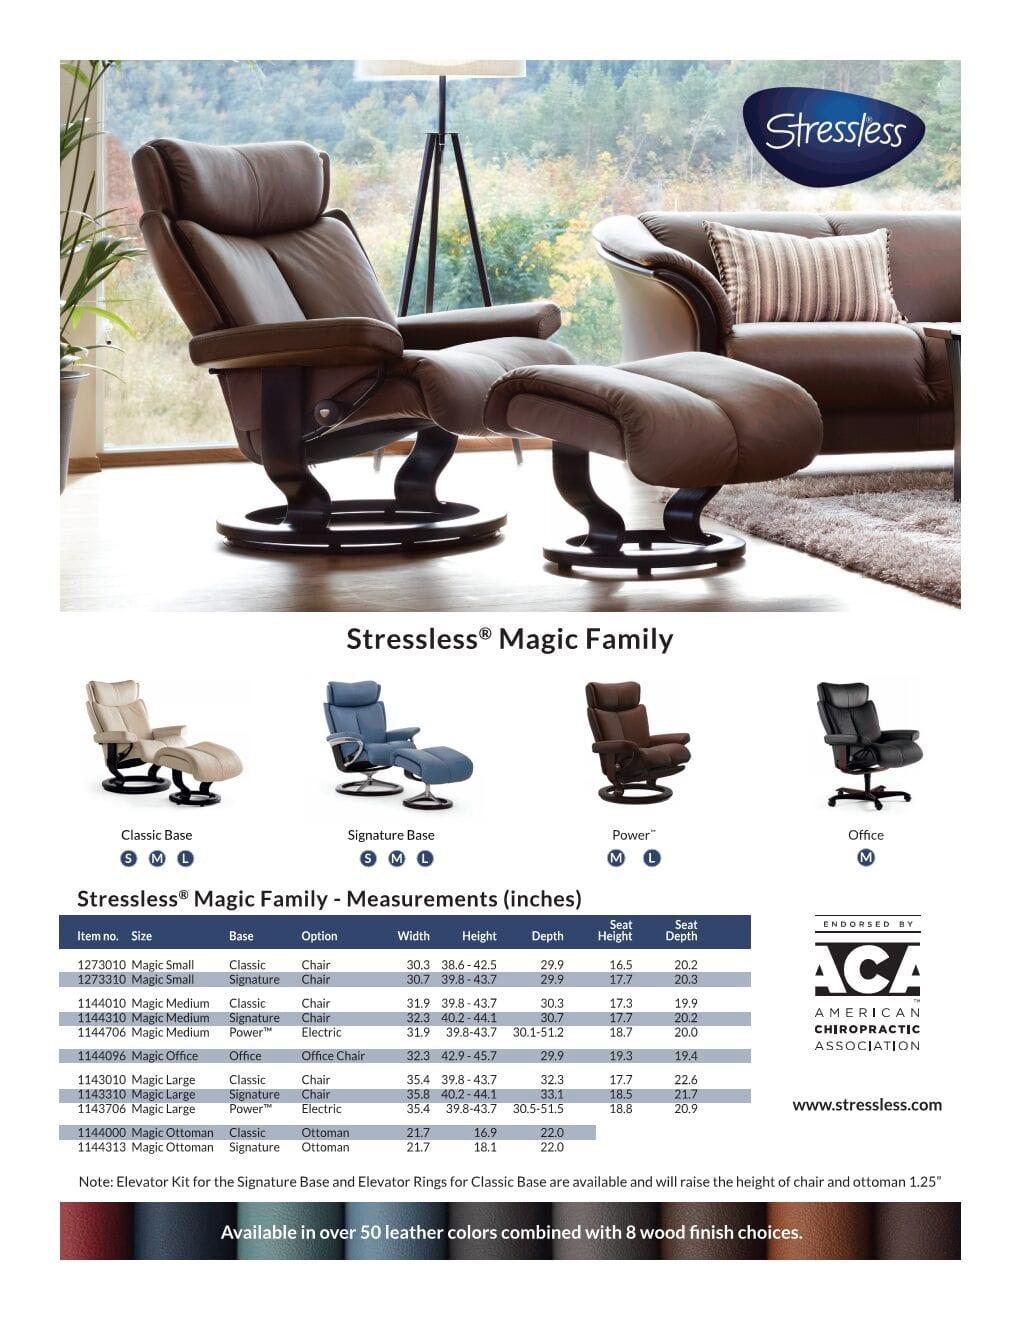 Stressless Magic Product Sheet